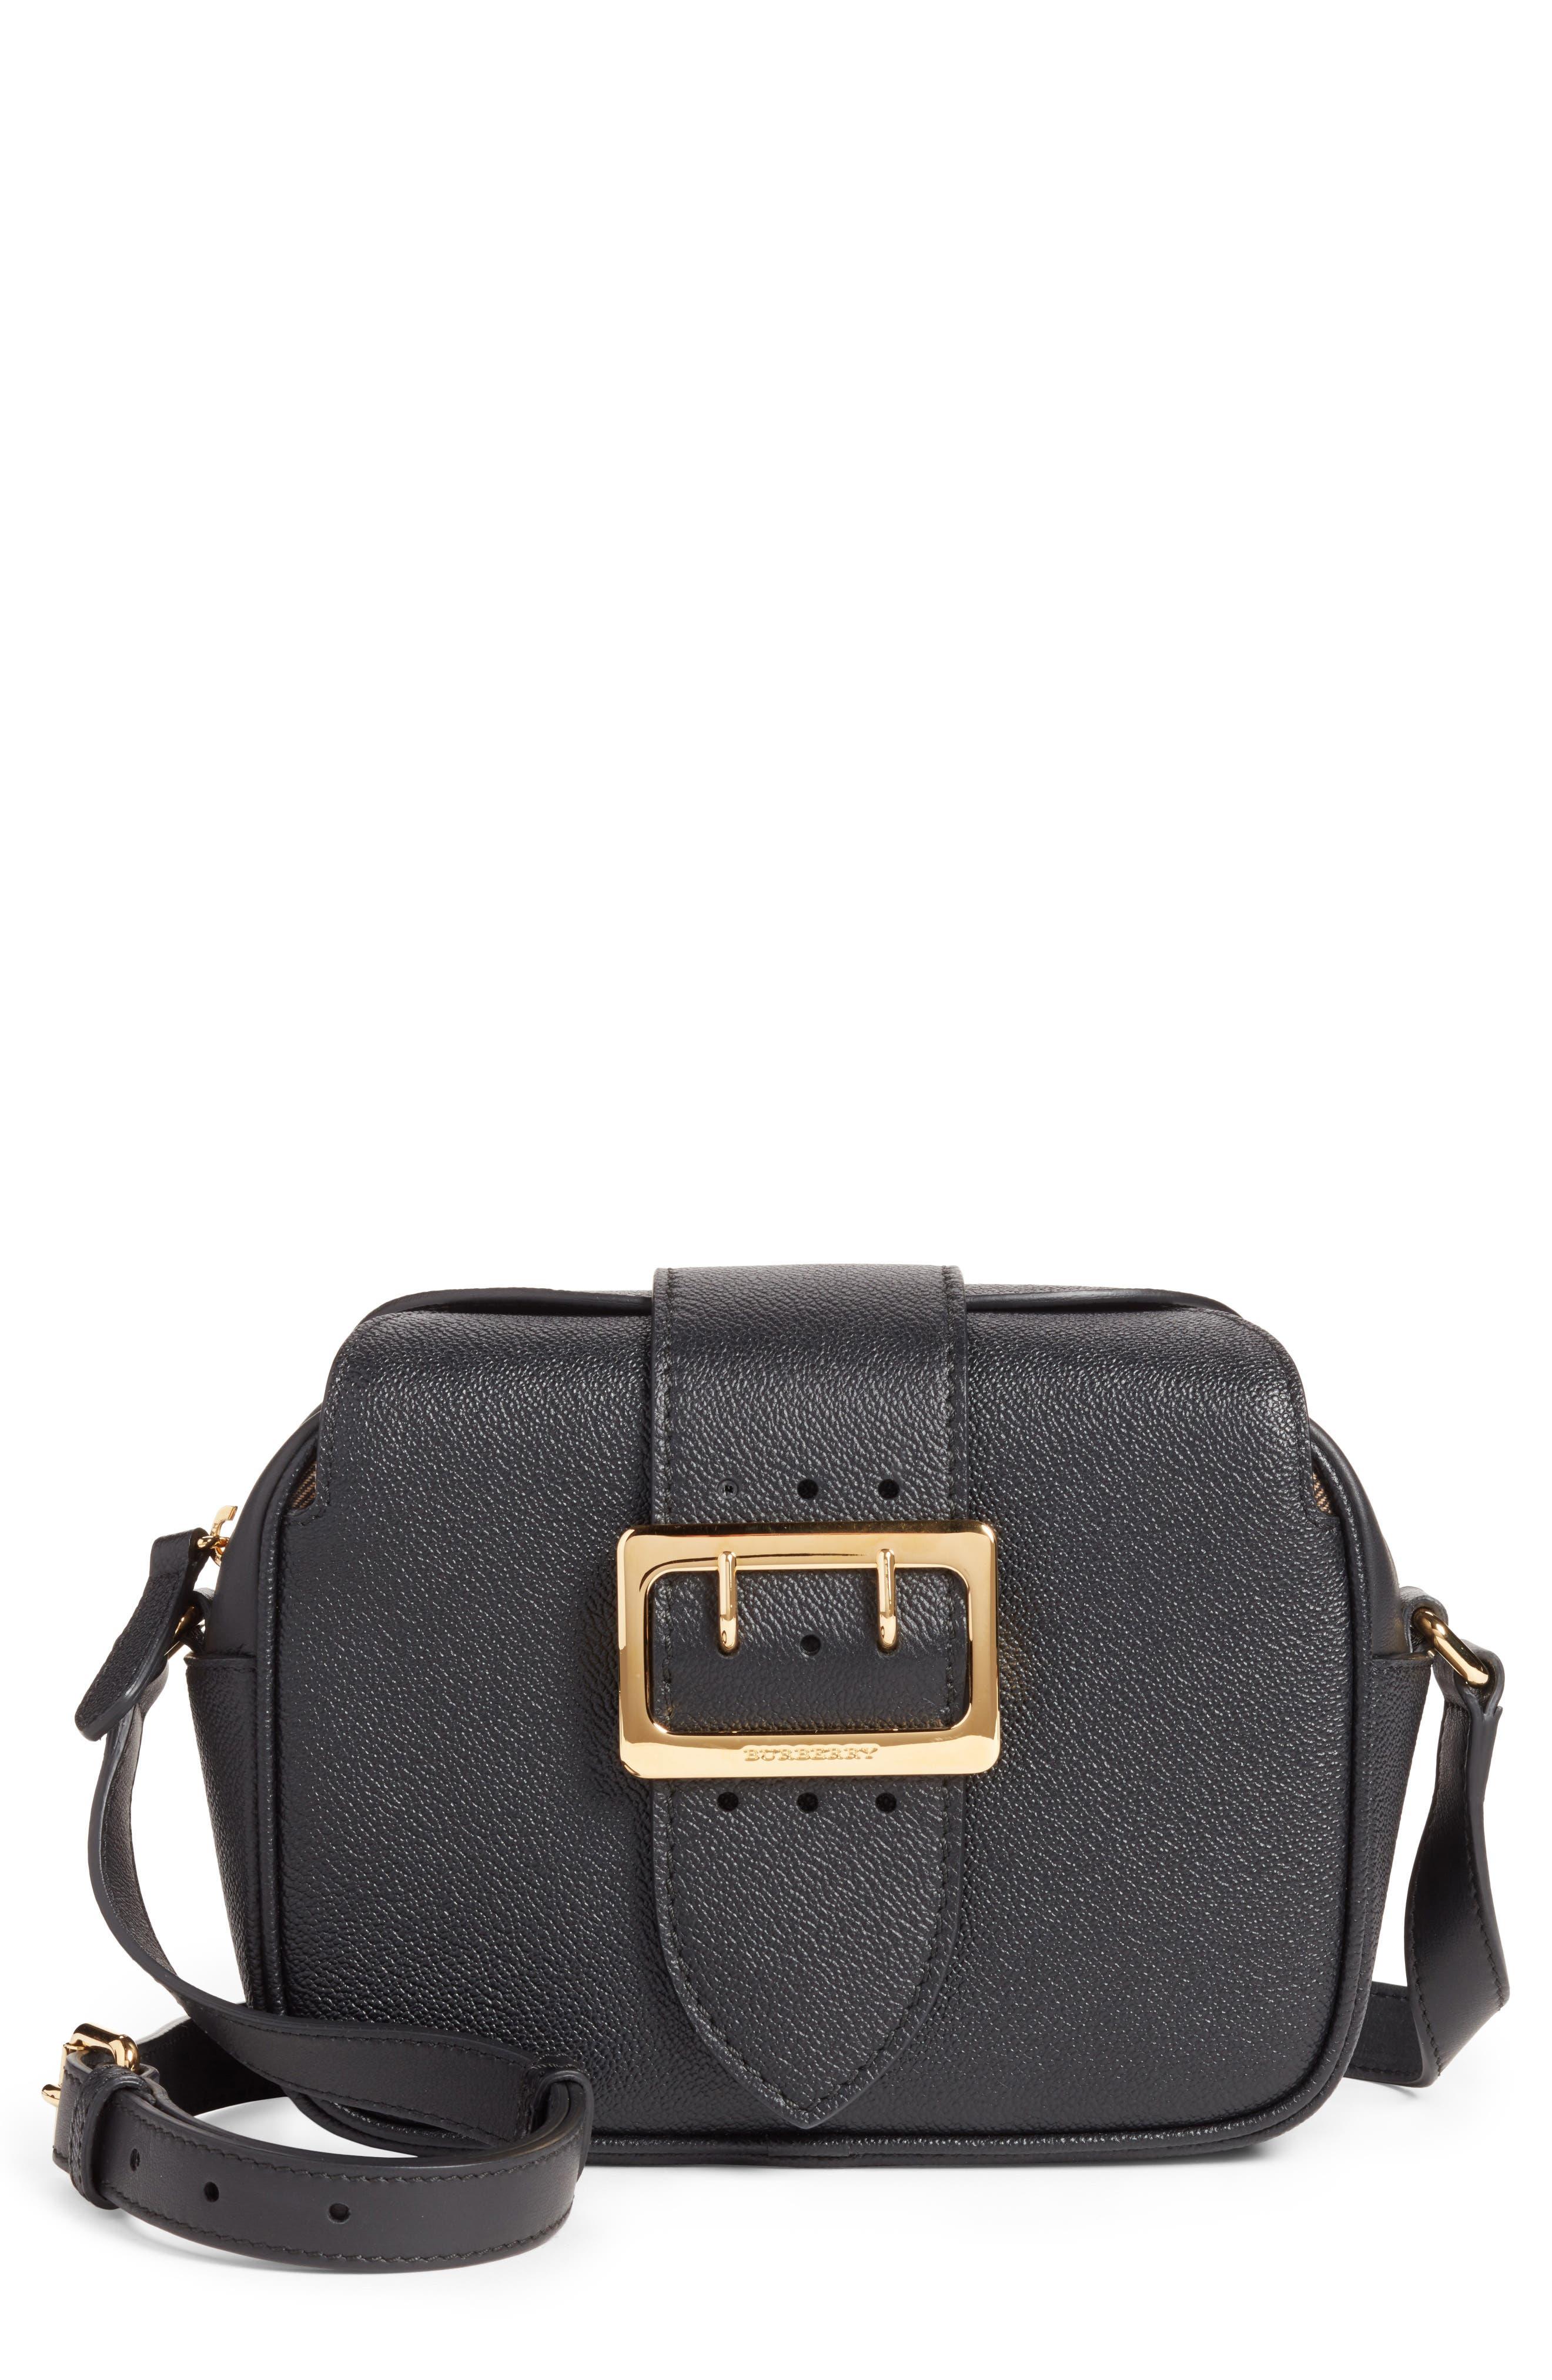 Burberry Small Buckle Leather Crossbody Bag